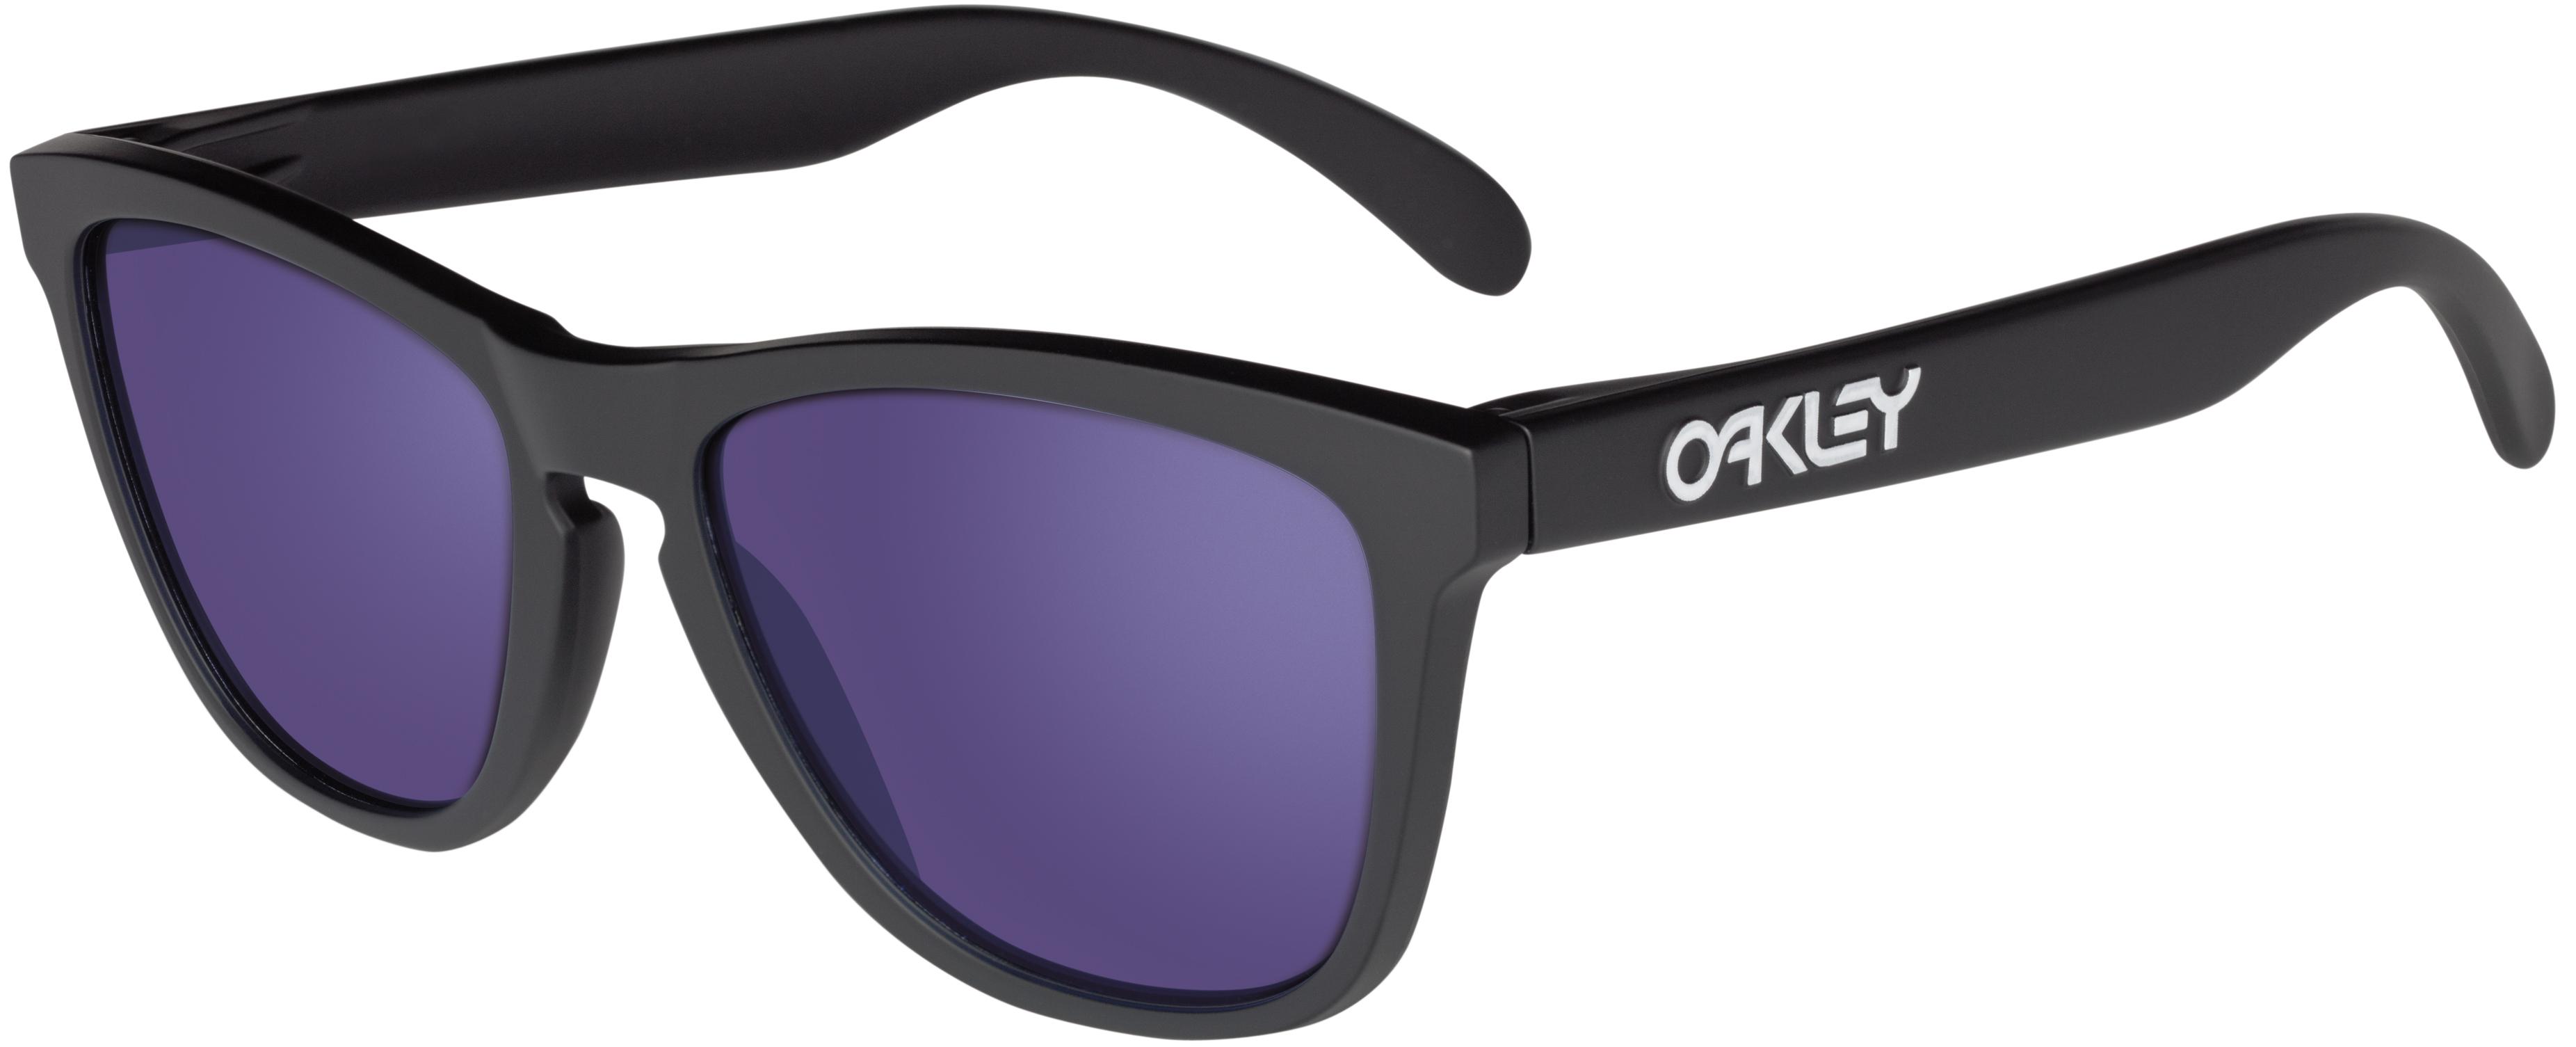 db51007df9 Oakley Frogskins Sunglasses - Unisex